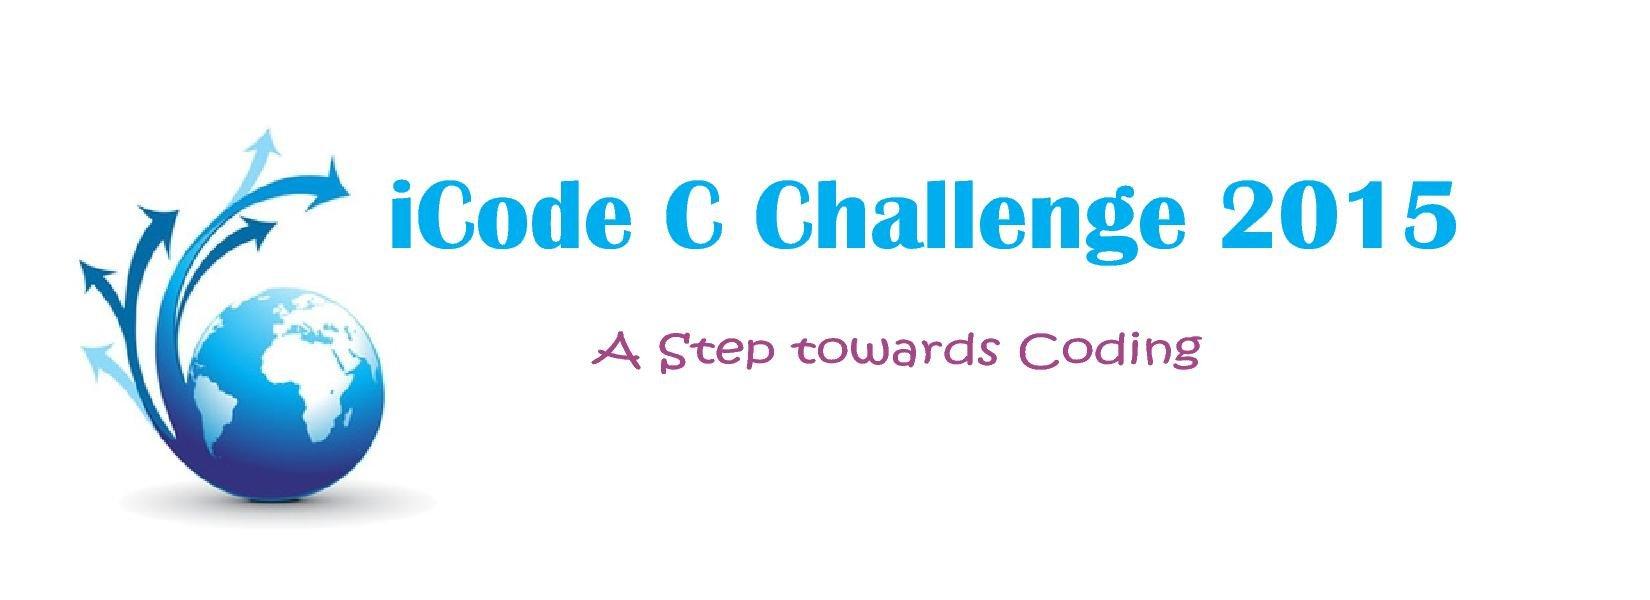 iCode C-Challenge 2015 logo